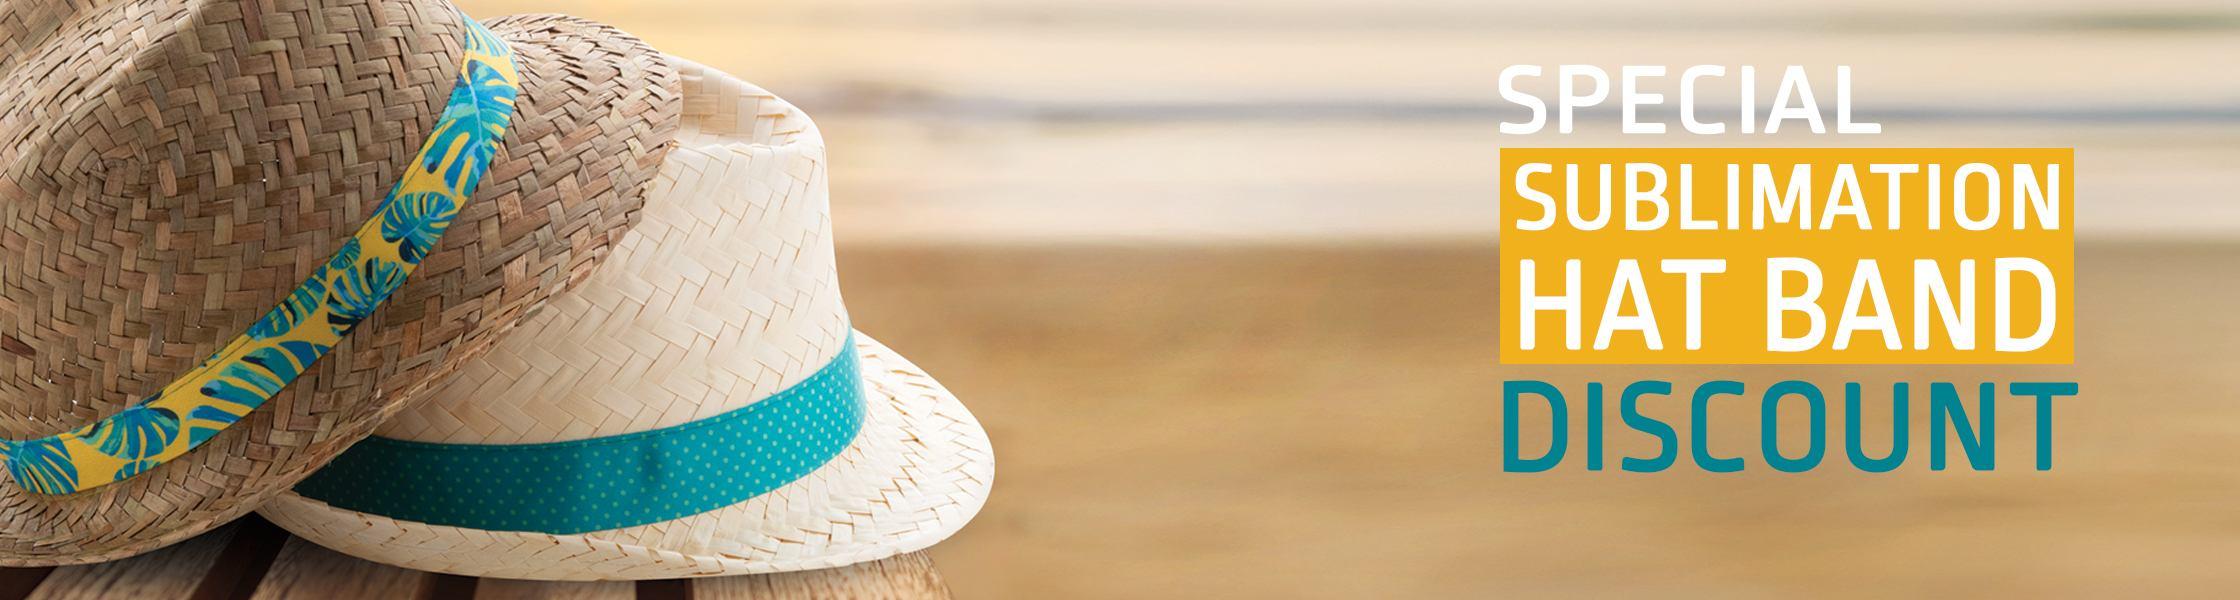 Enjoy the sunshine and protect yourself! - Coupon code: SUBRERO20